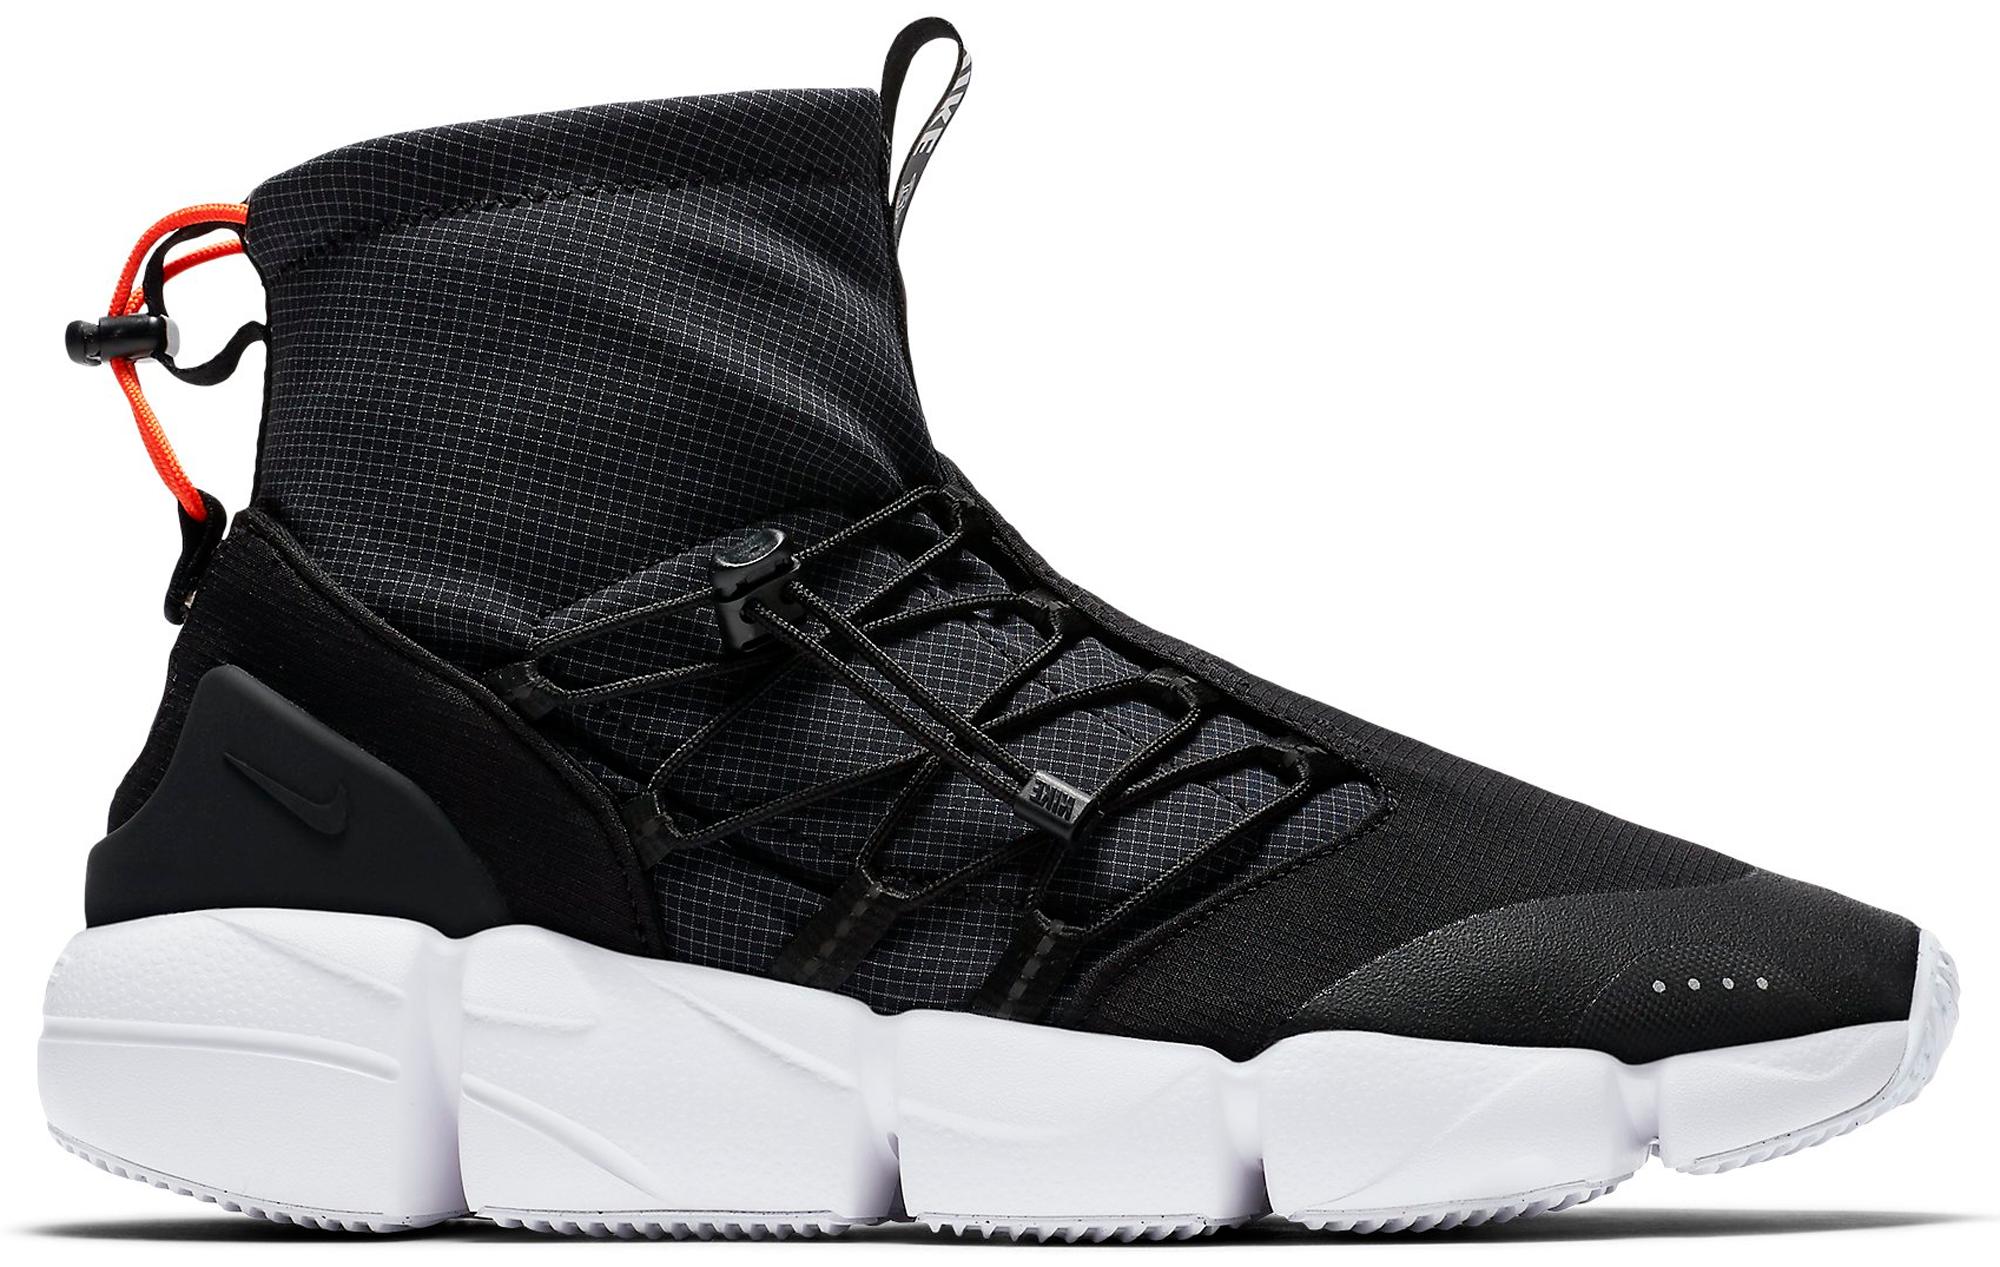 Nike Air Footscape Mid Utility DM Black